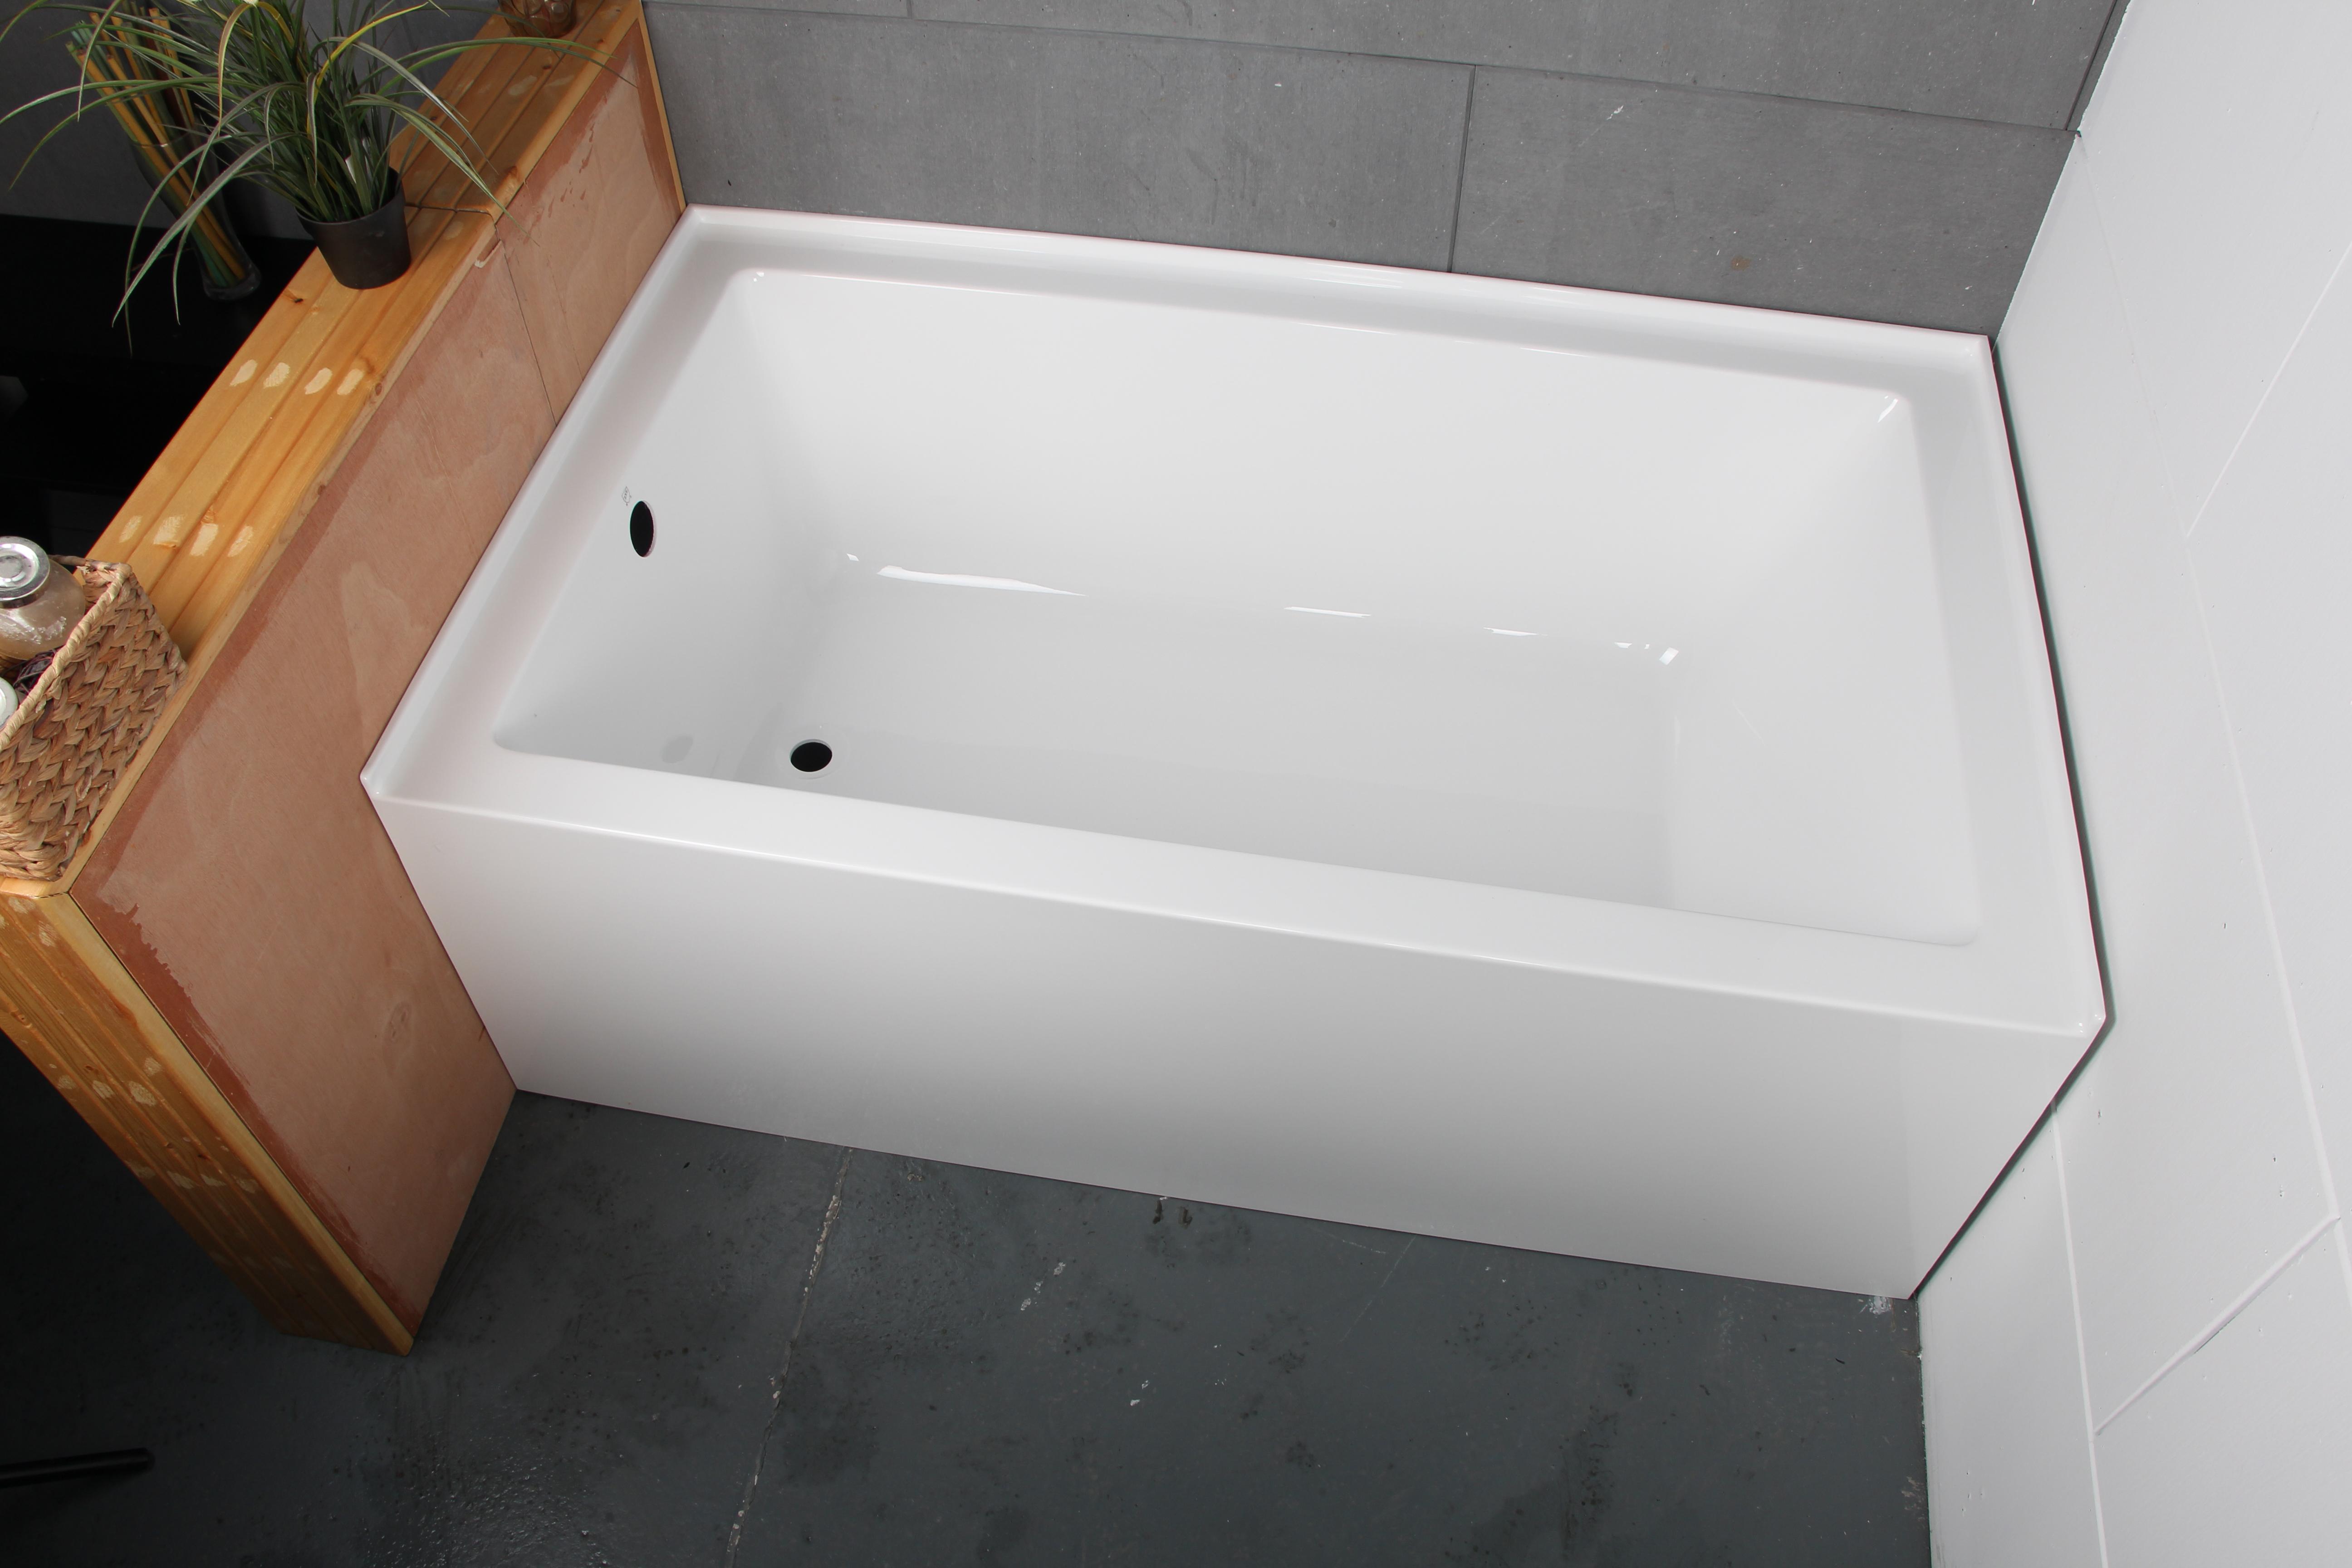 philadelphia supply wall deco soaking downtown tub htm price mxx tubs call inc three grove soak bathtub for alcove